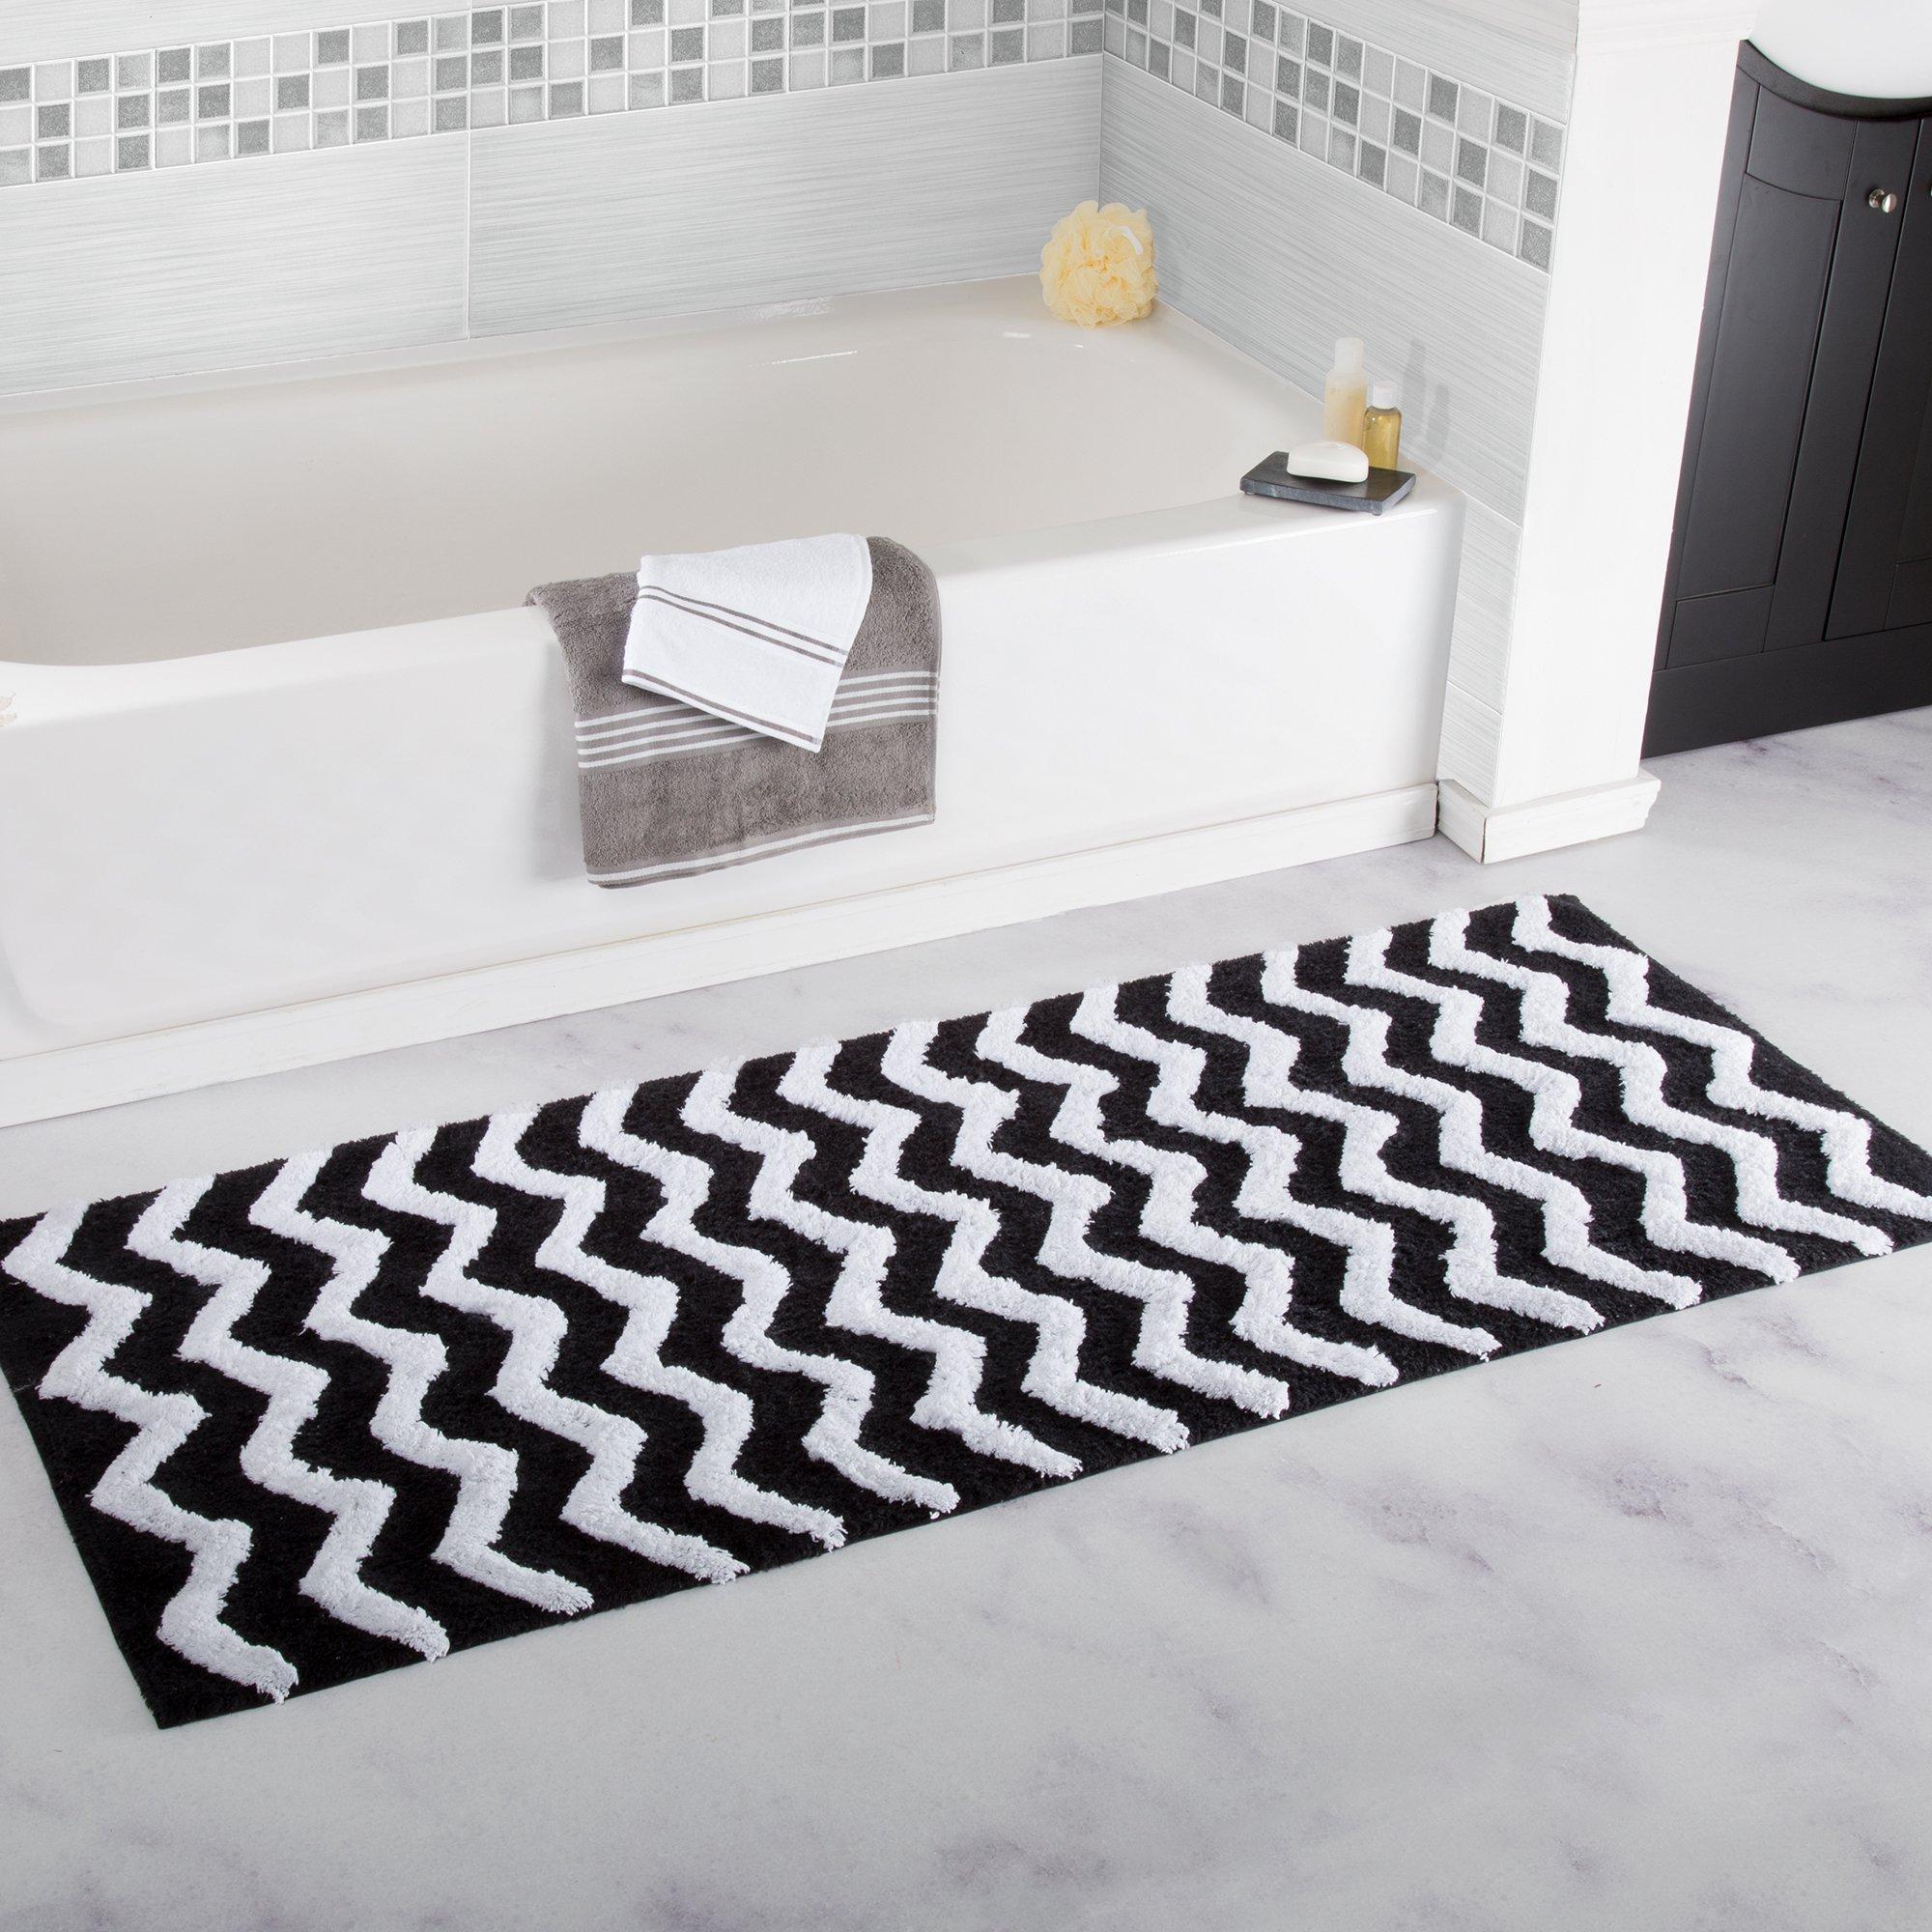 Bedford Home 100% Cotton Chevron Bathroom Mat - 24x60 inches - Black